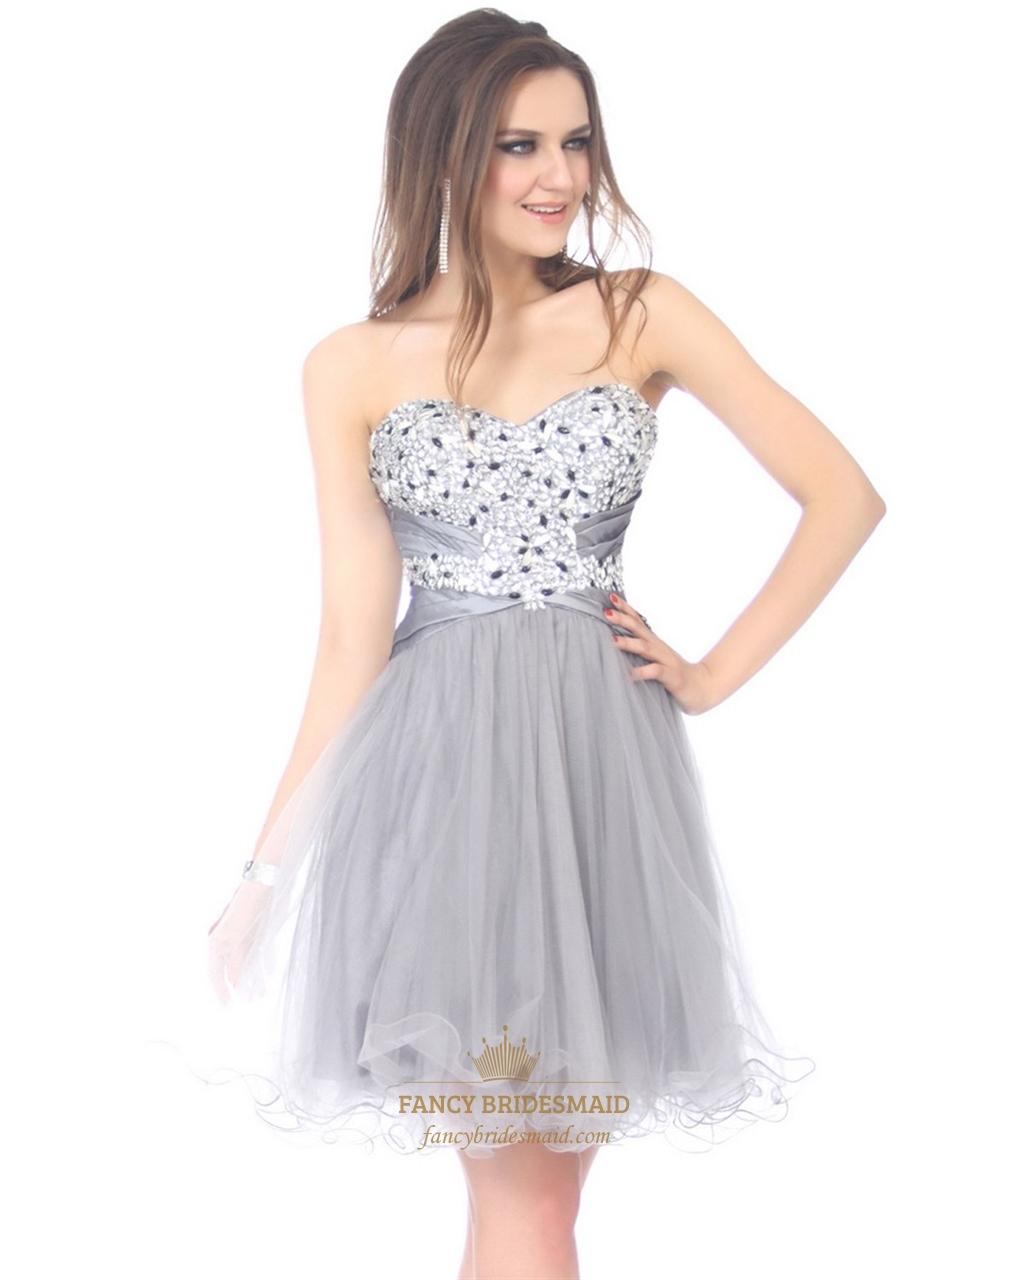 Light Dresses Damas Salient Junior Graduation: Light Grey Beaded Bodice Strapless Sweetheart Dress With